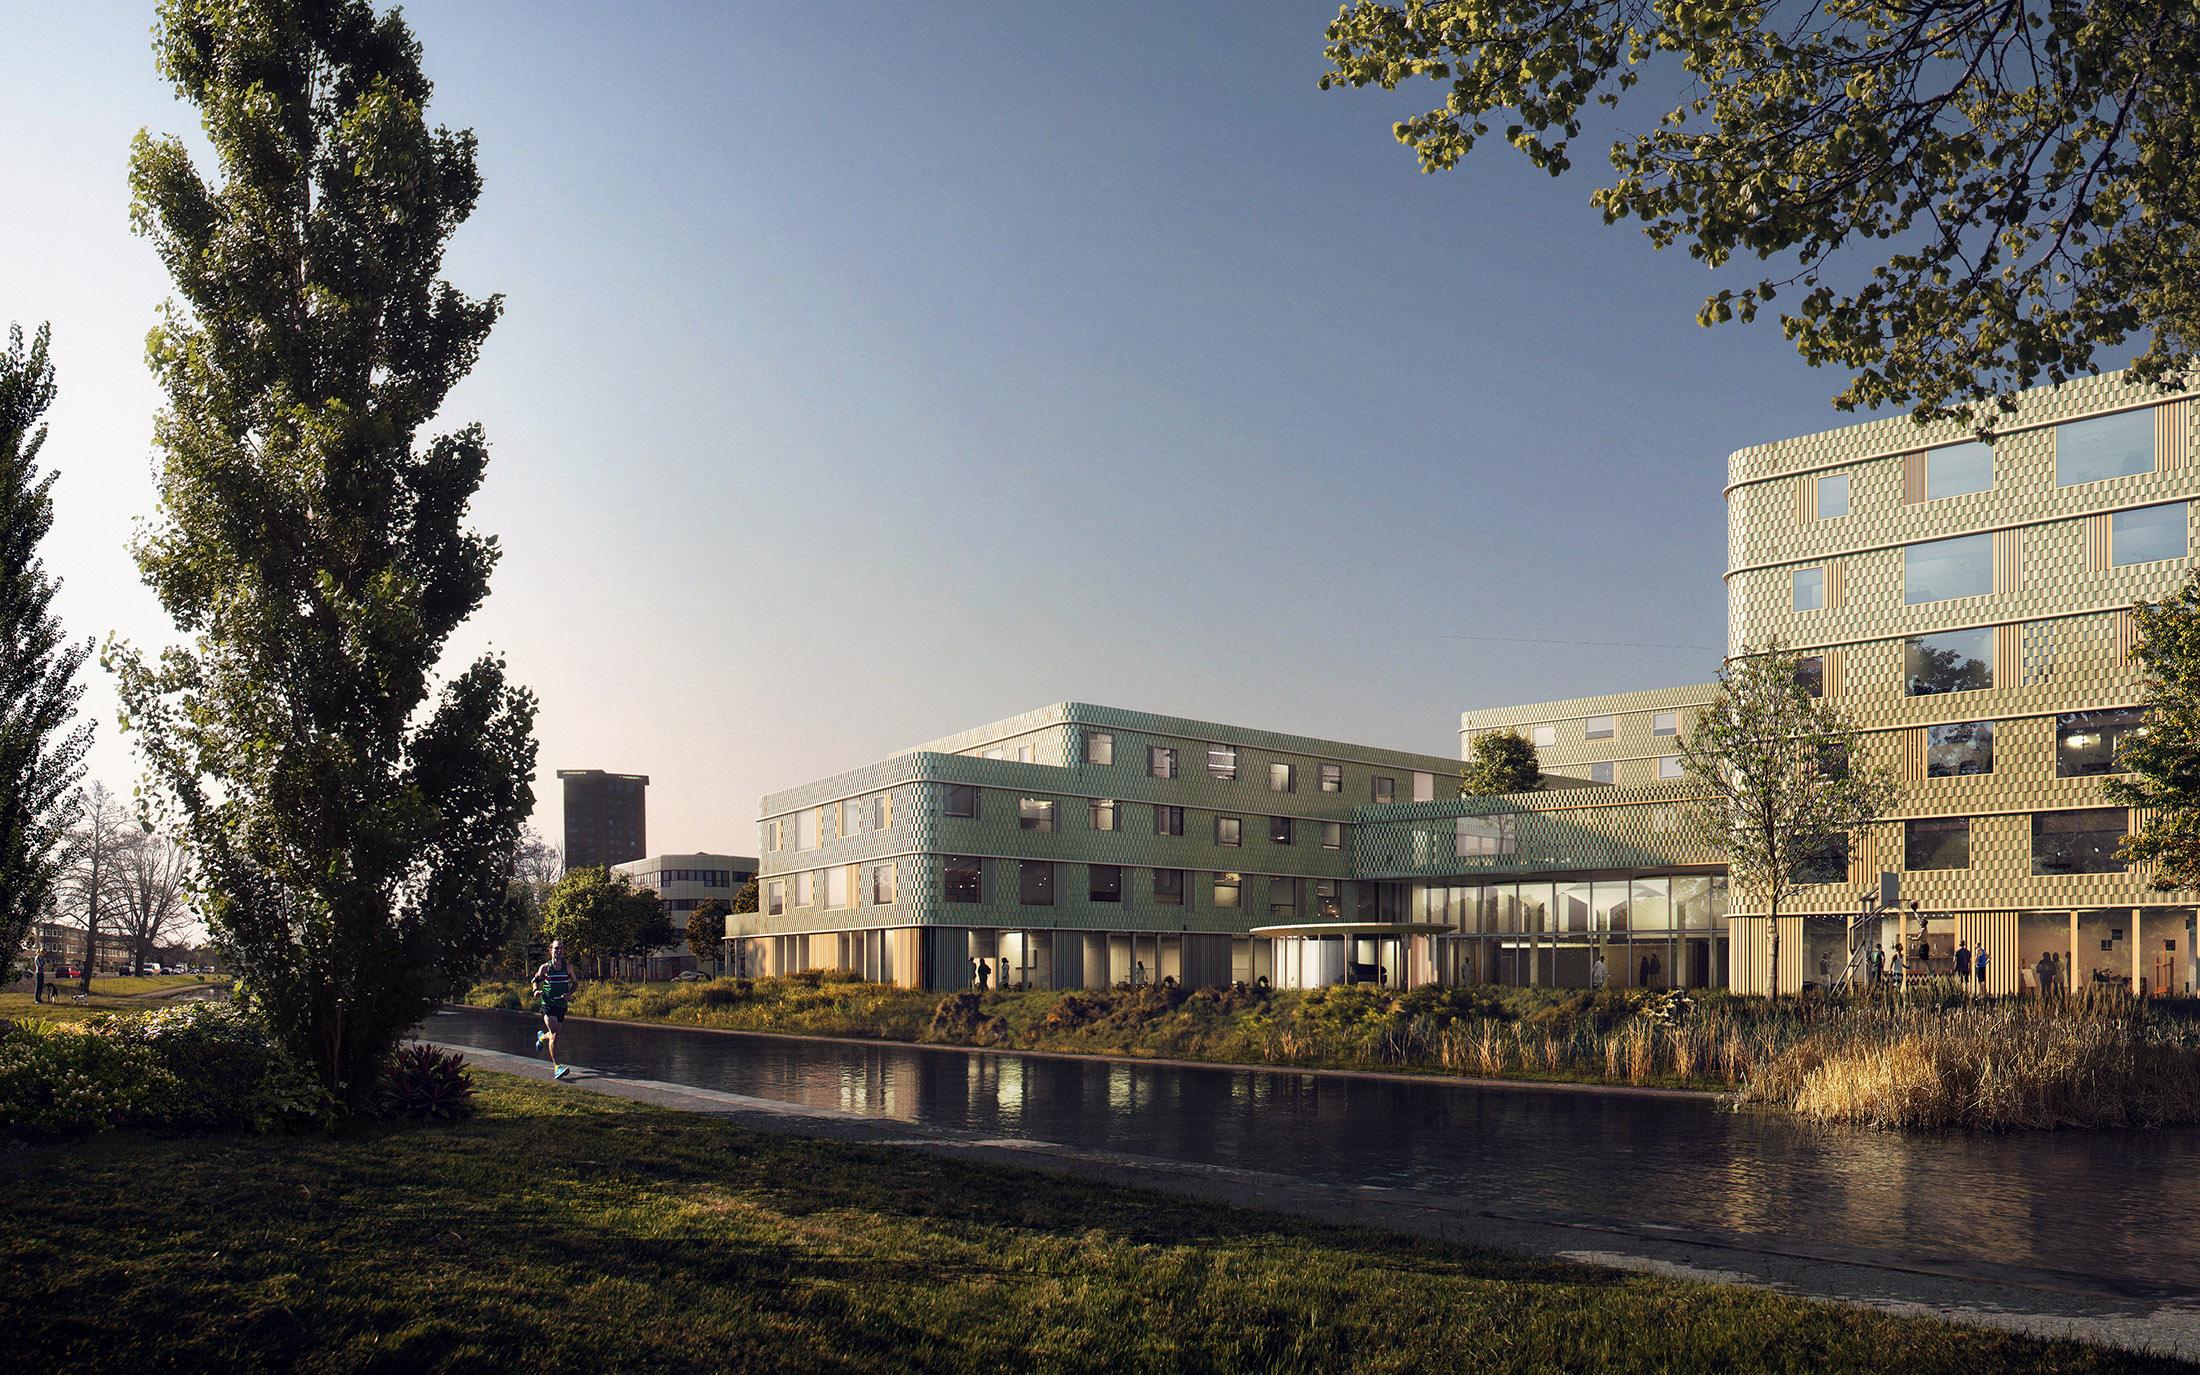 Powerhouse Company, Psychiatric Center, The Netherlands, 2018